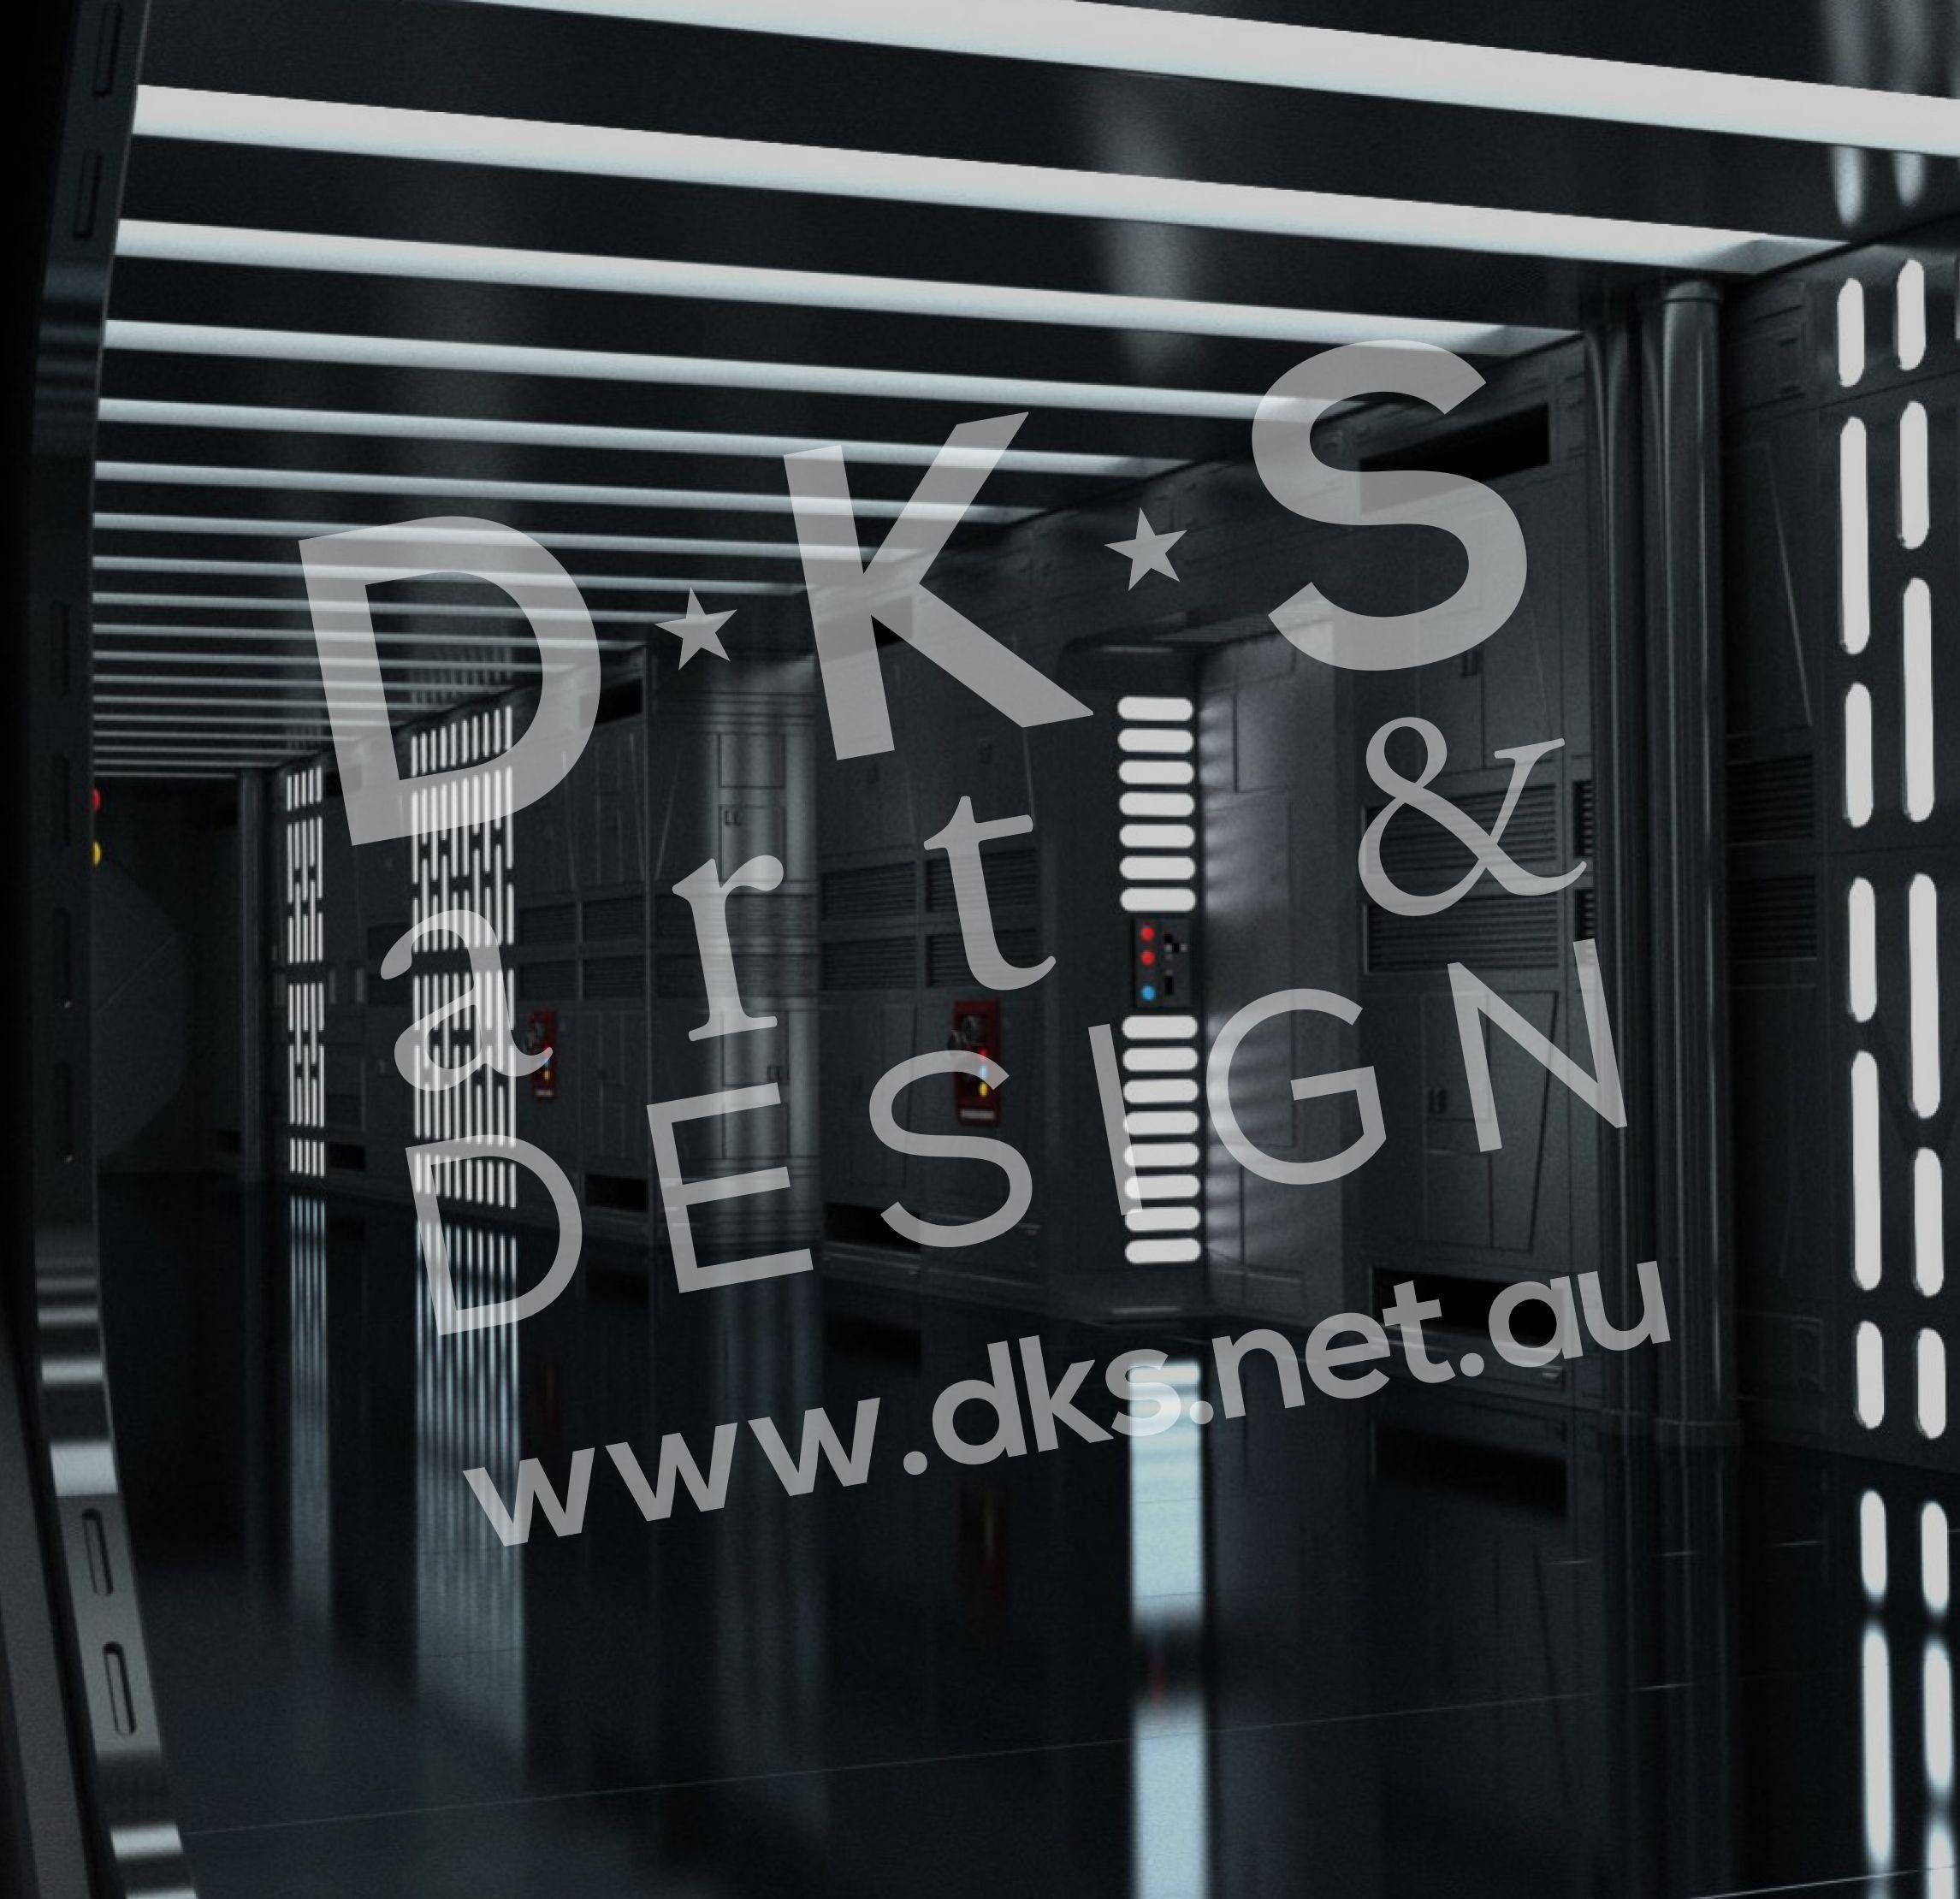 Star Wars Cabinet Star Wars Death Star Display Background Design For Detolf Display